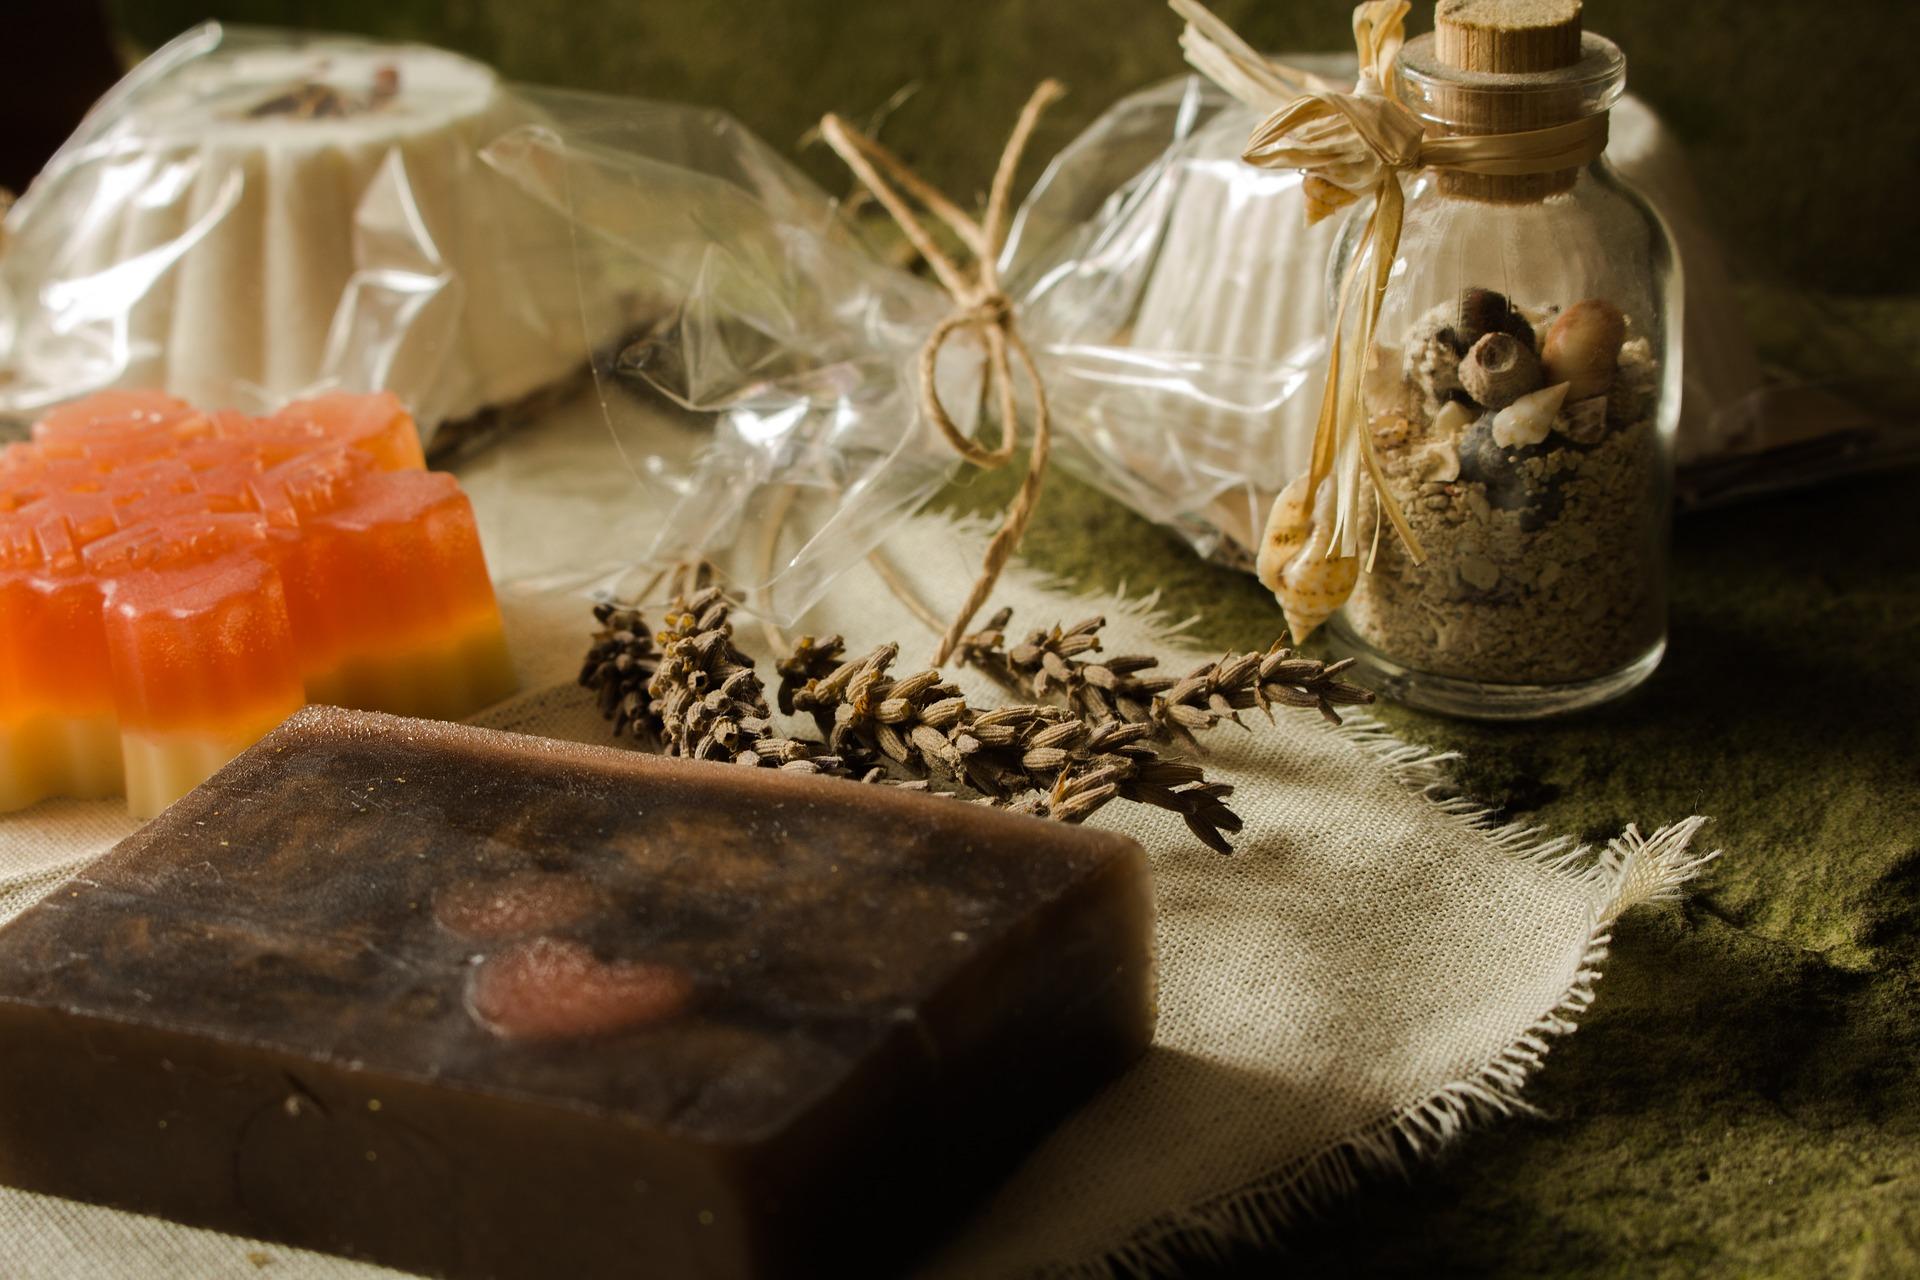 soap-3773185_1920